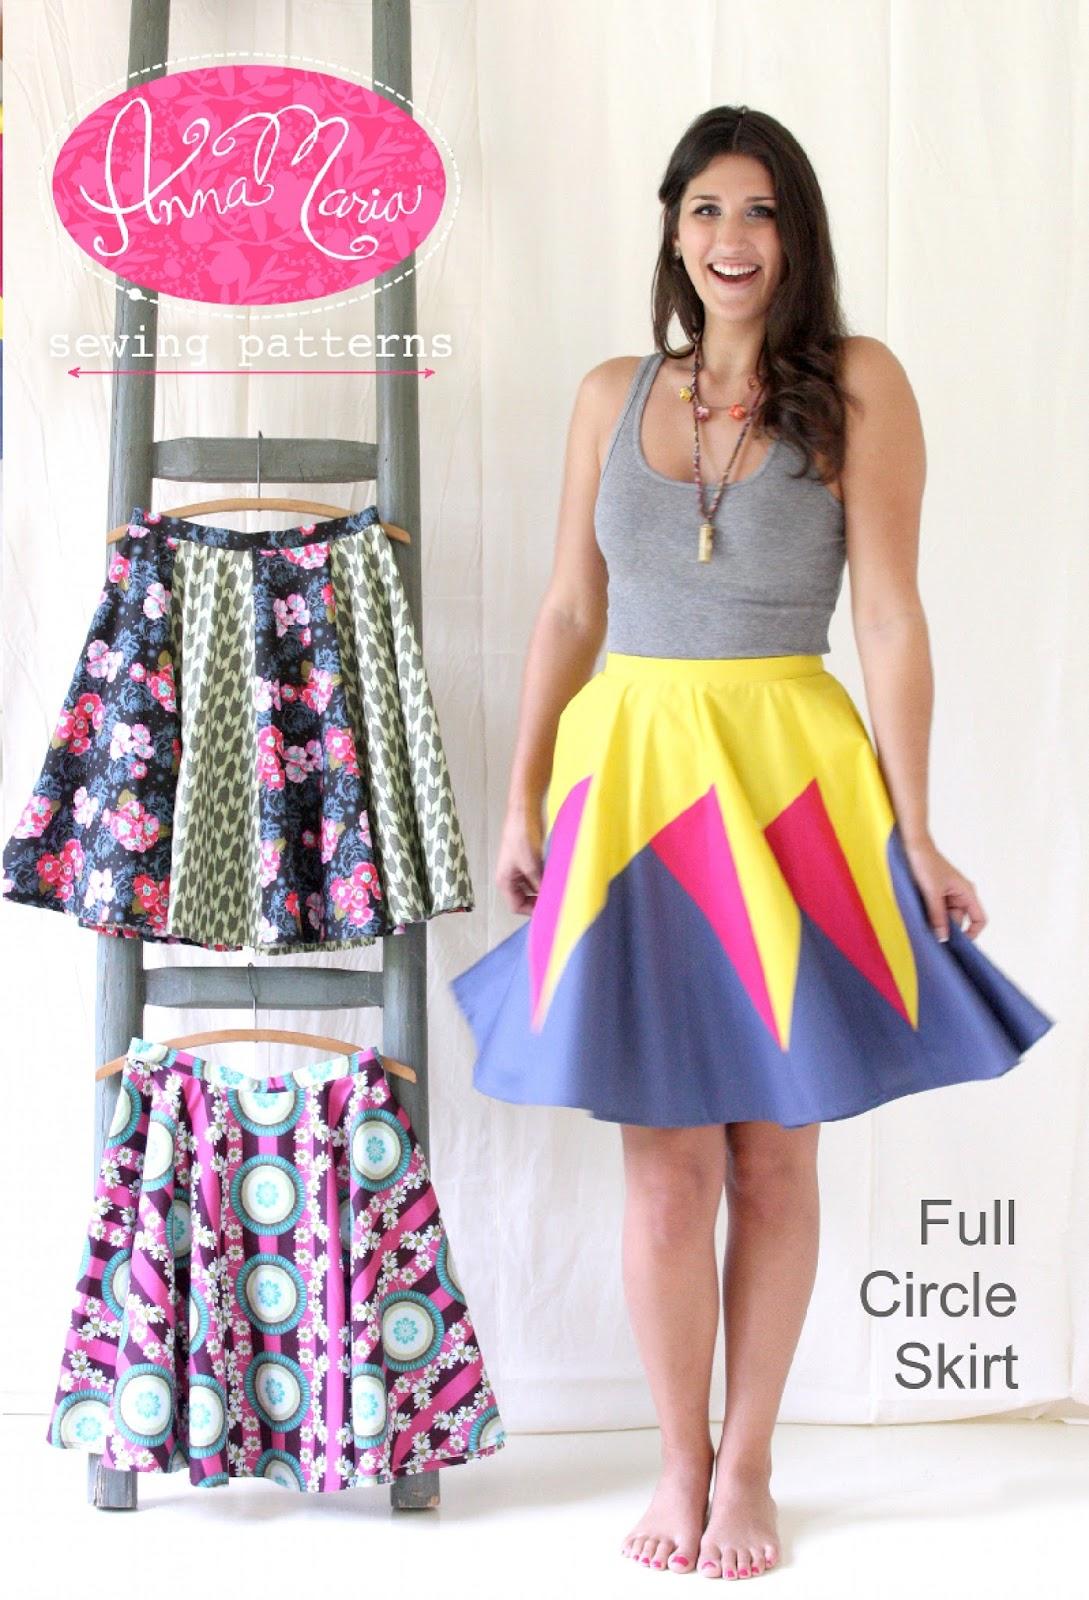 Cassie Stephens Diy The Anna Maria Horner Full Circle Skirt